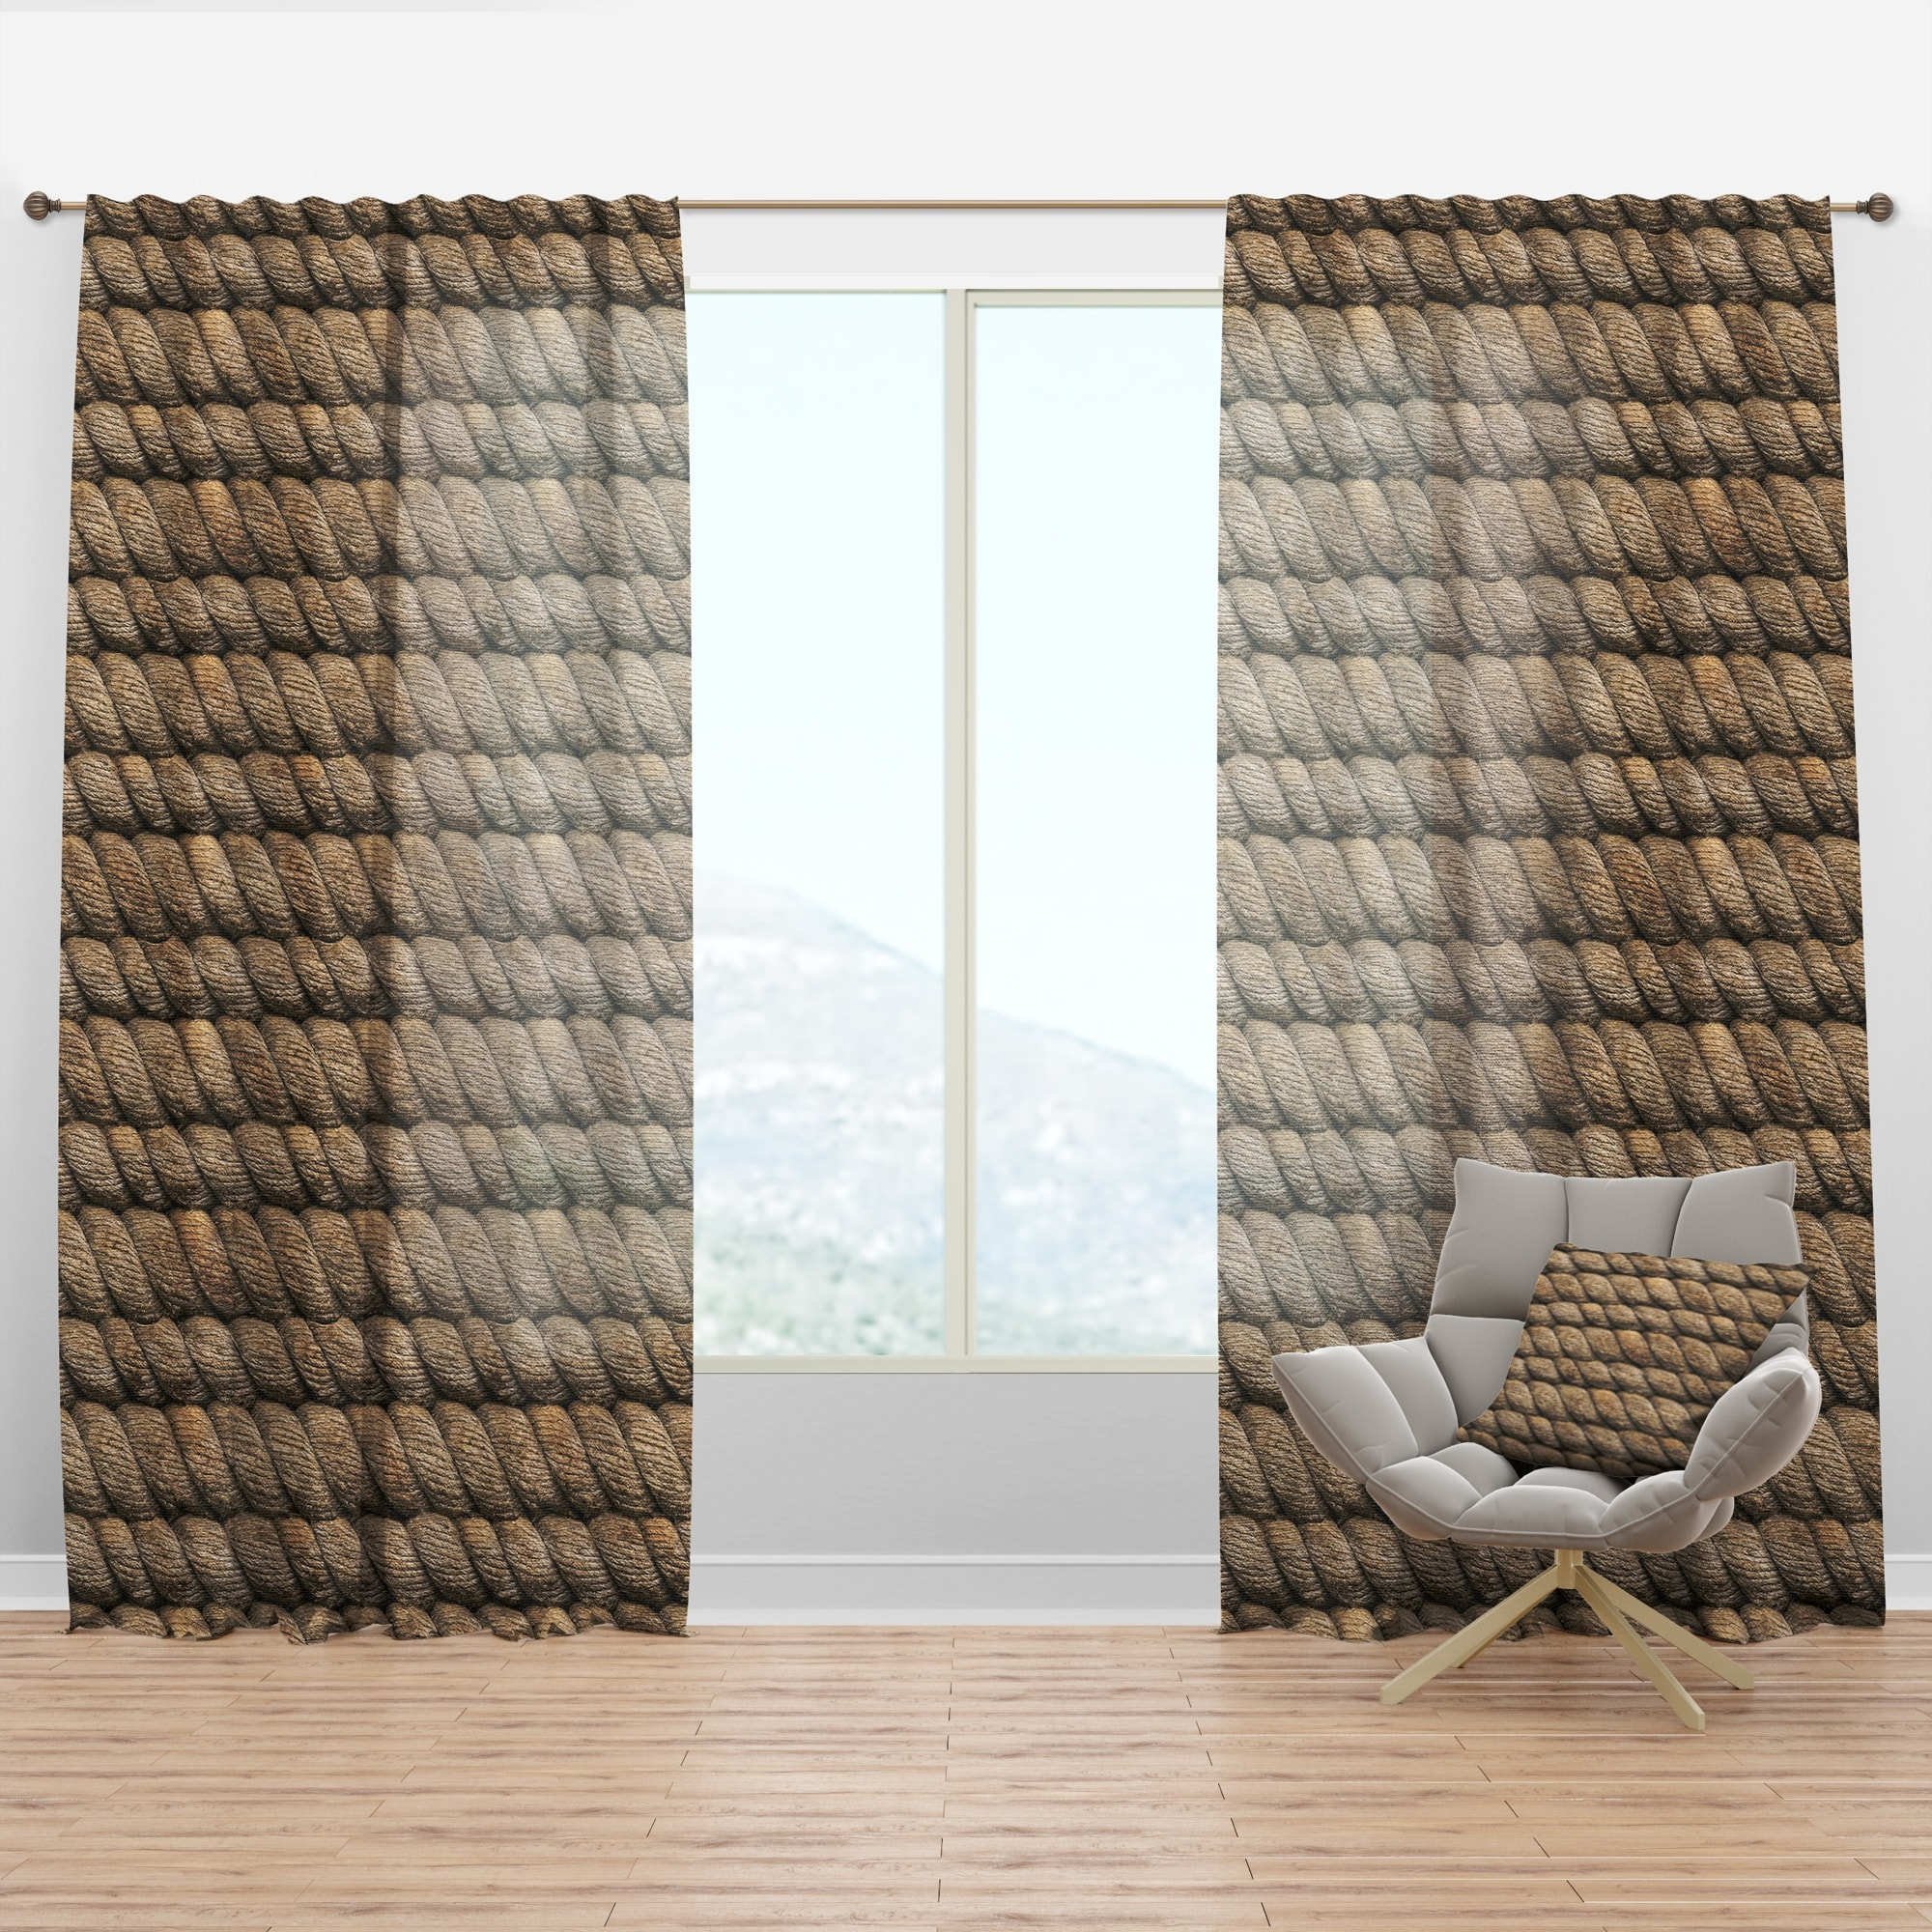 Designart Hemp Rope Farmhouse Curtain Panel On Sale Overstock 29625127